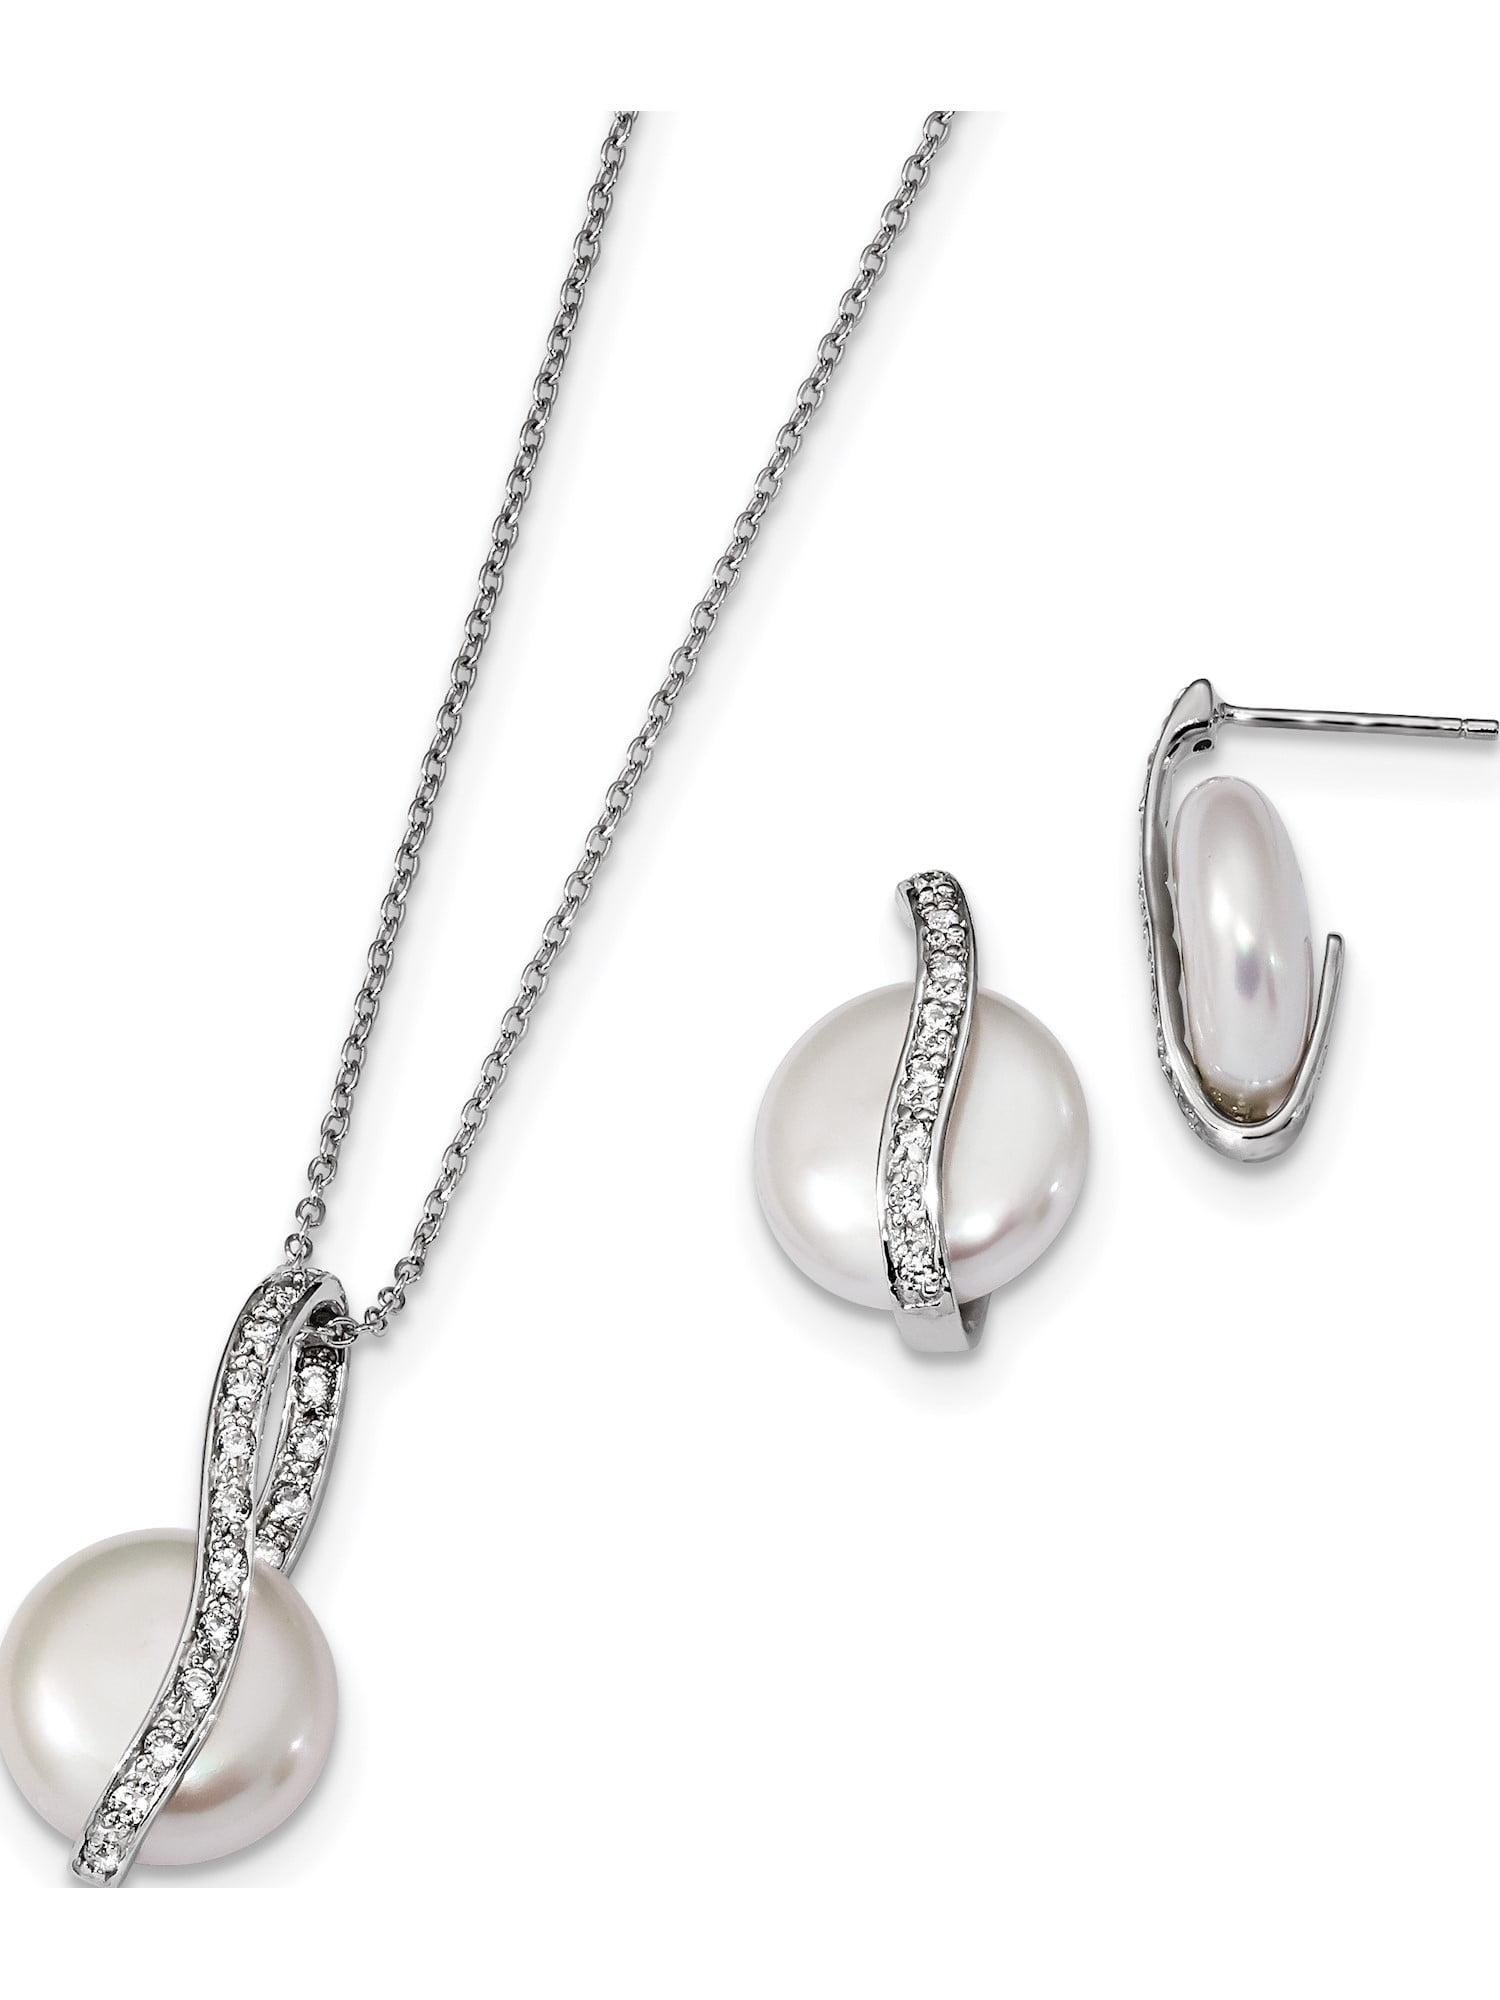 Sterling Silver RH 13-14mm White Button FWC Pearl Post Earrings